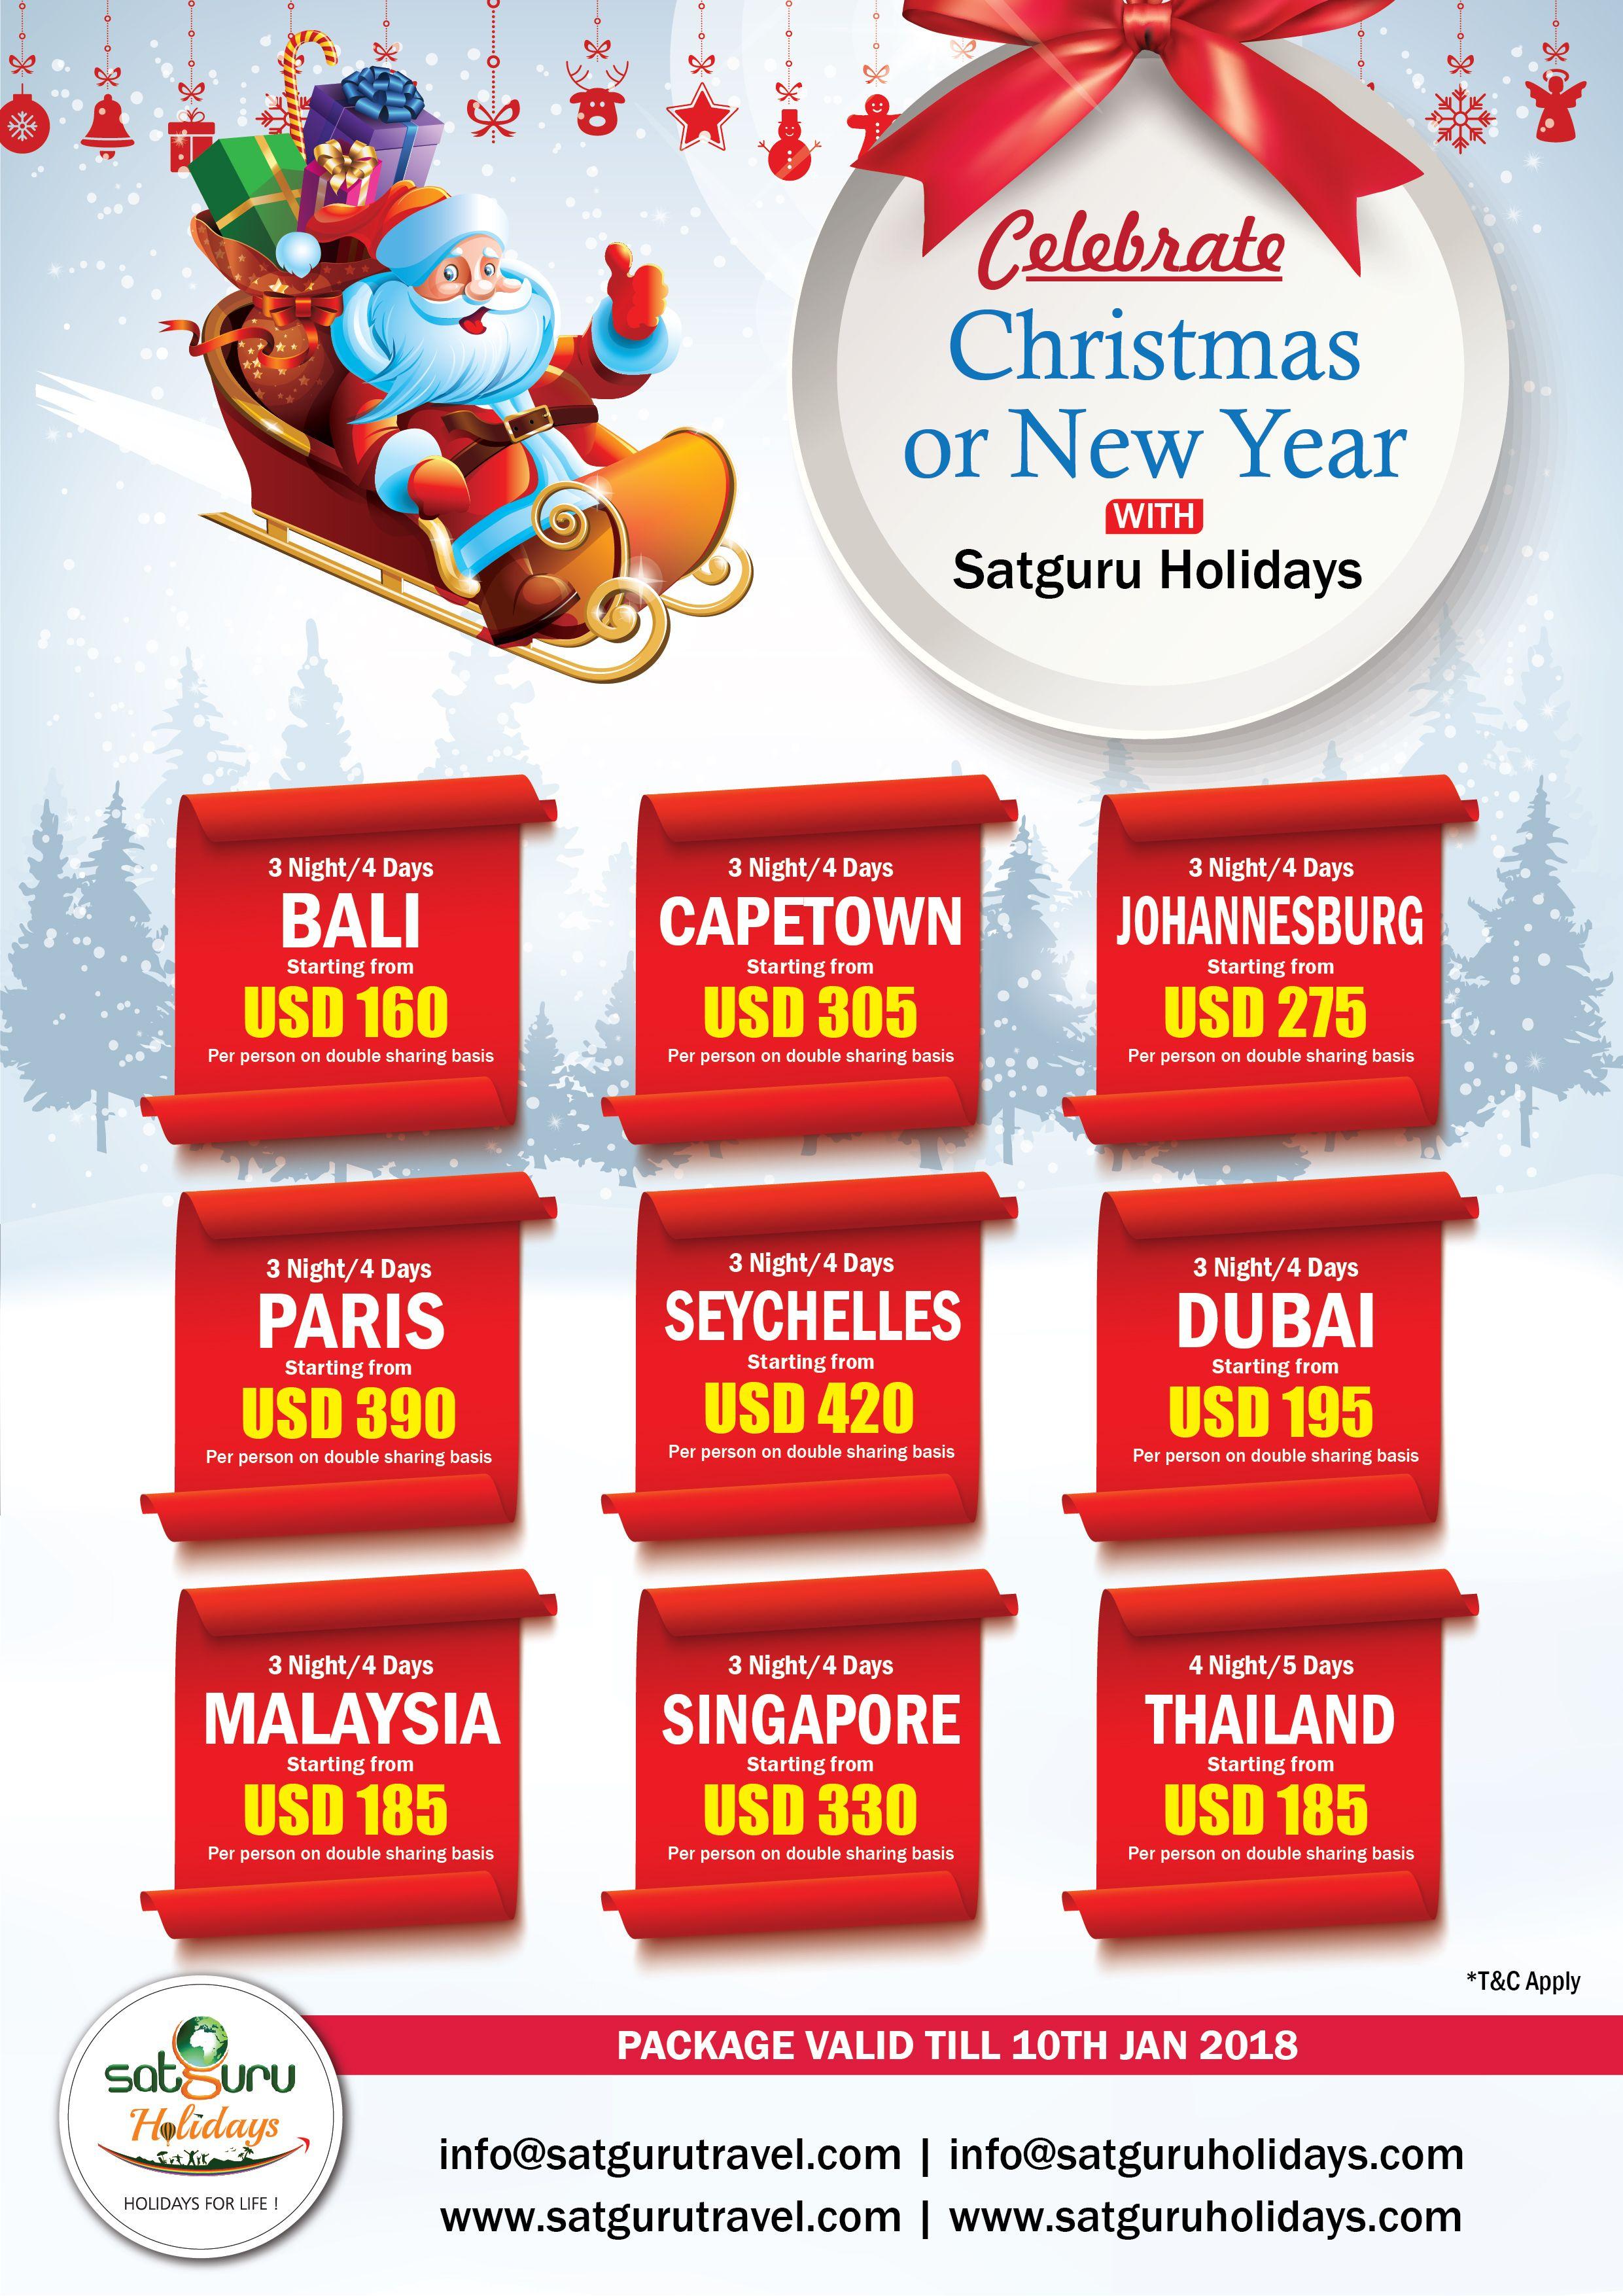 Idea by Satguru Holidays on Christmas & New Year 2018